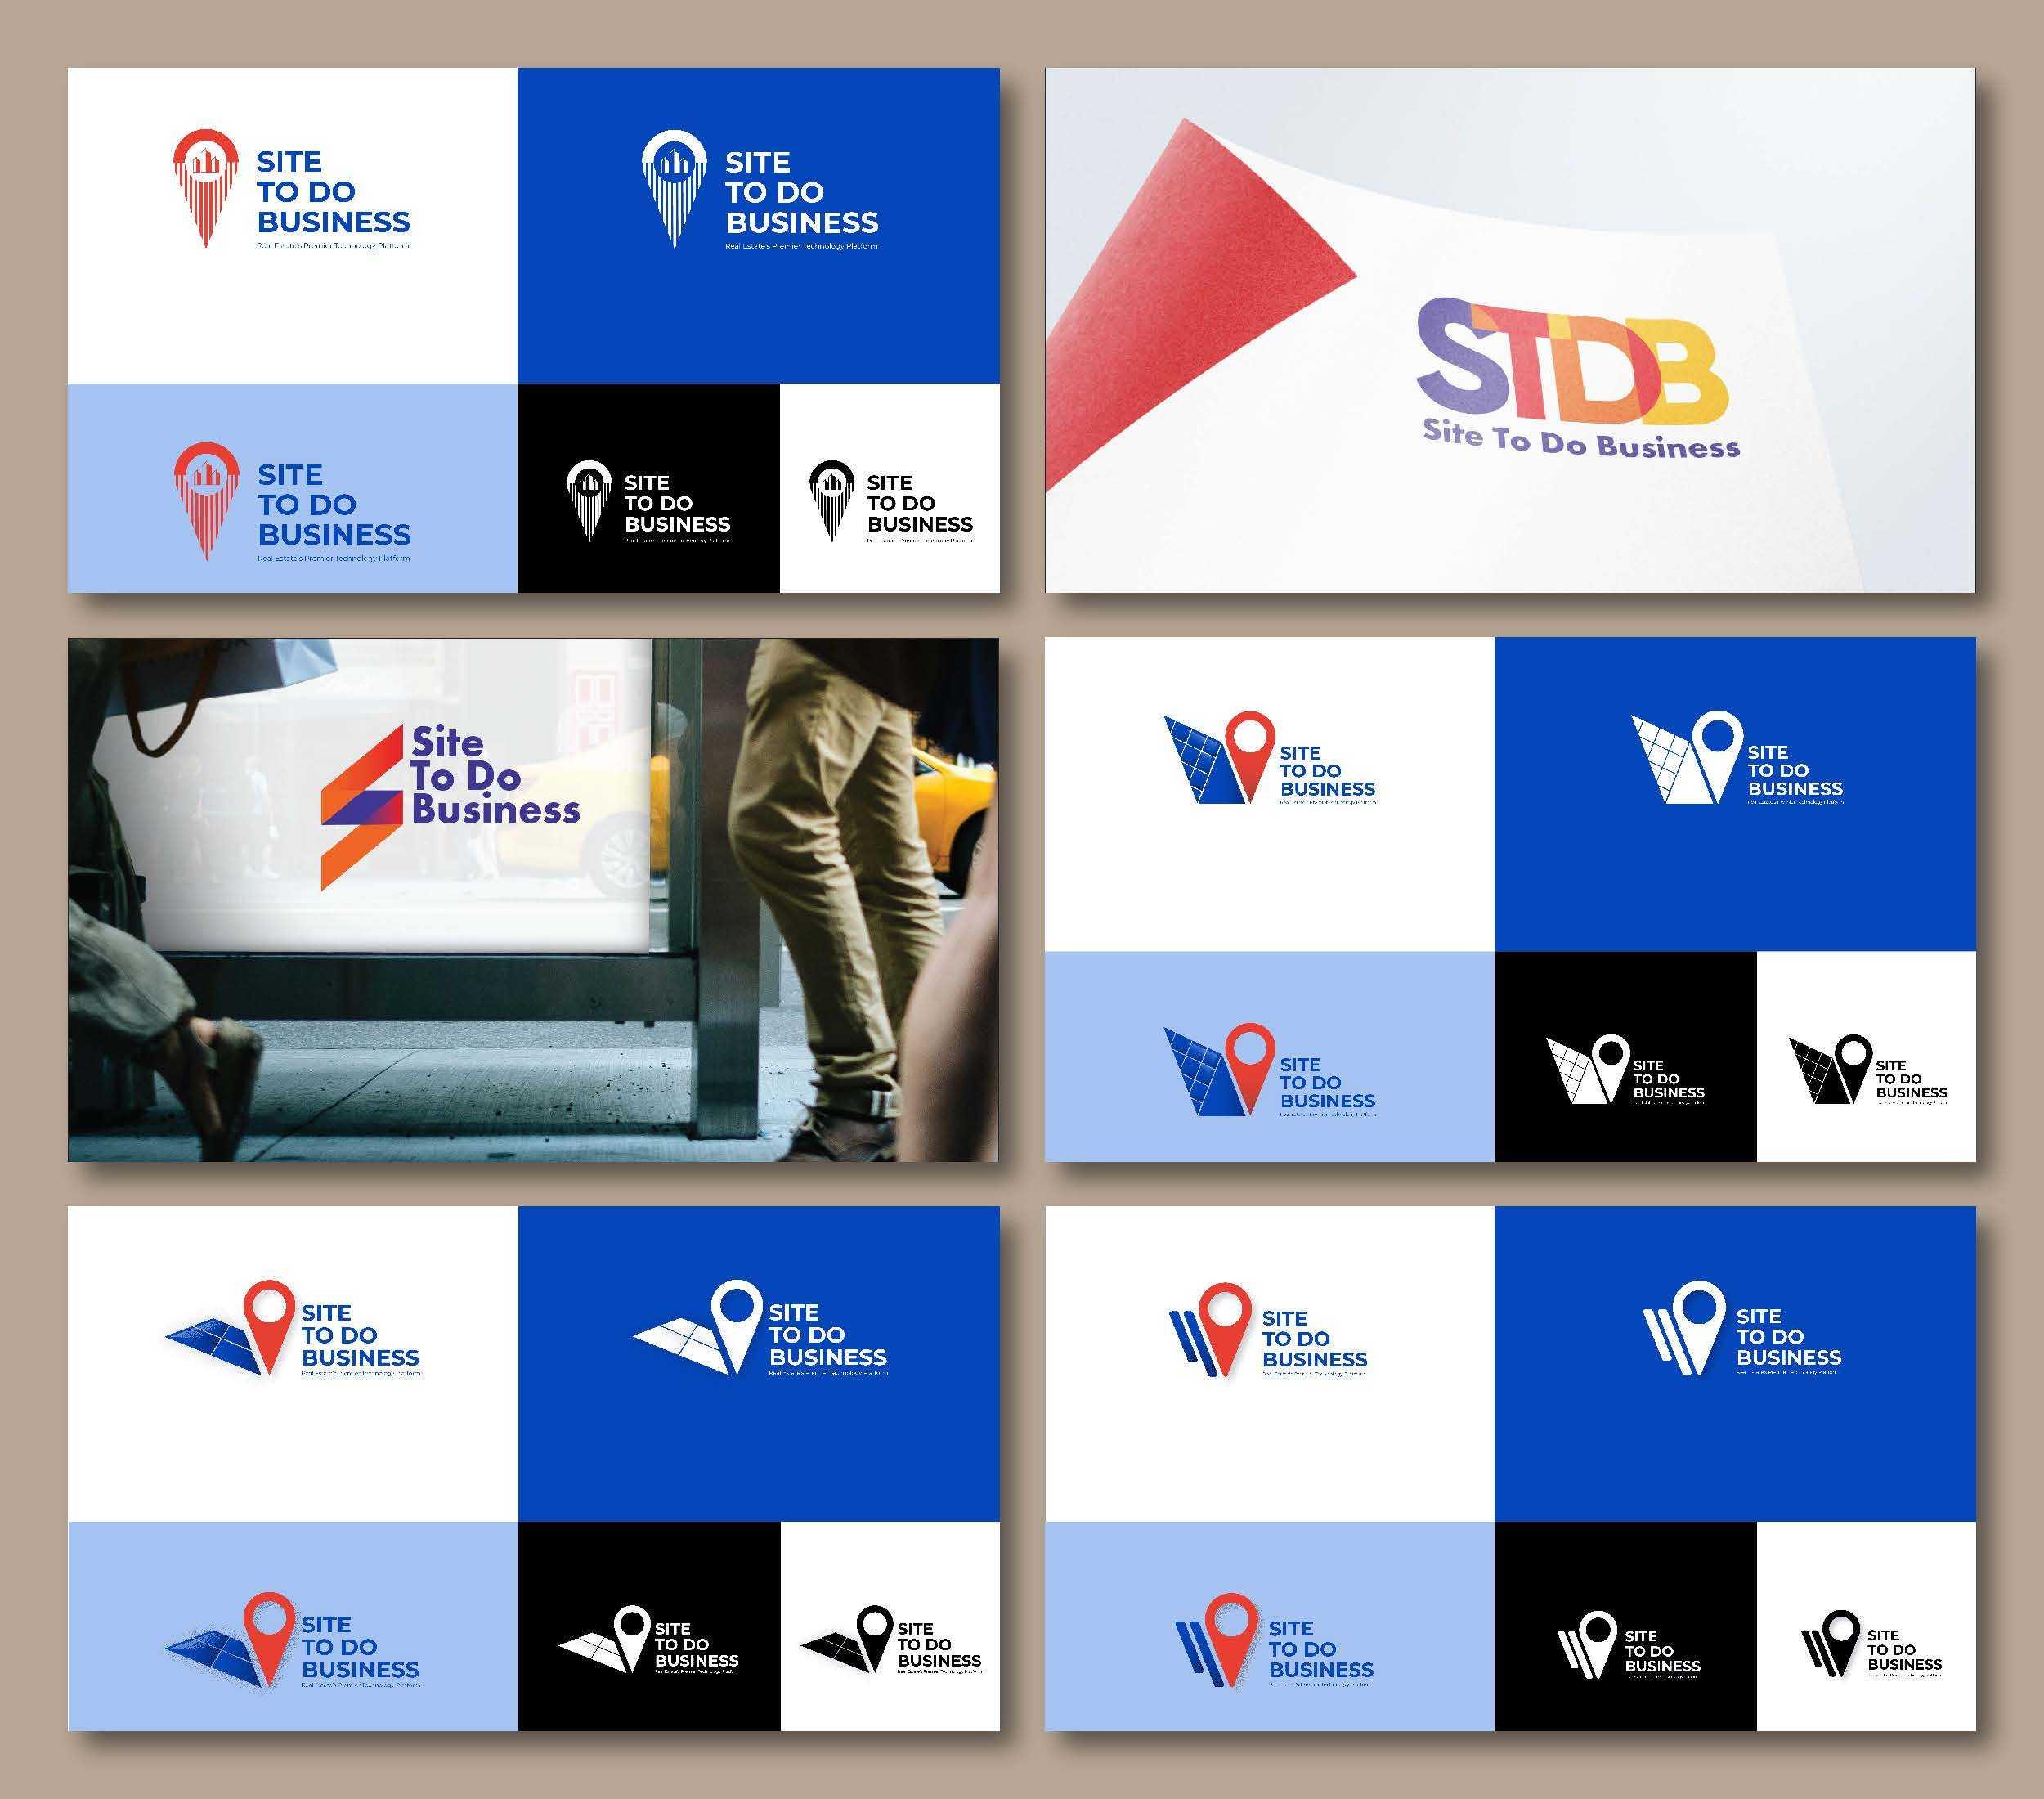 Examples of different STDB logos.